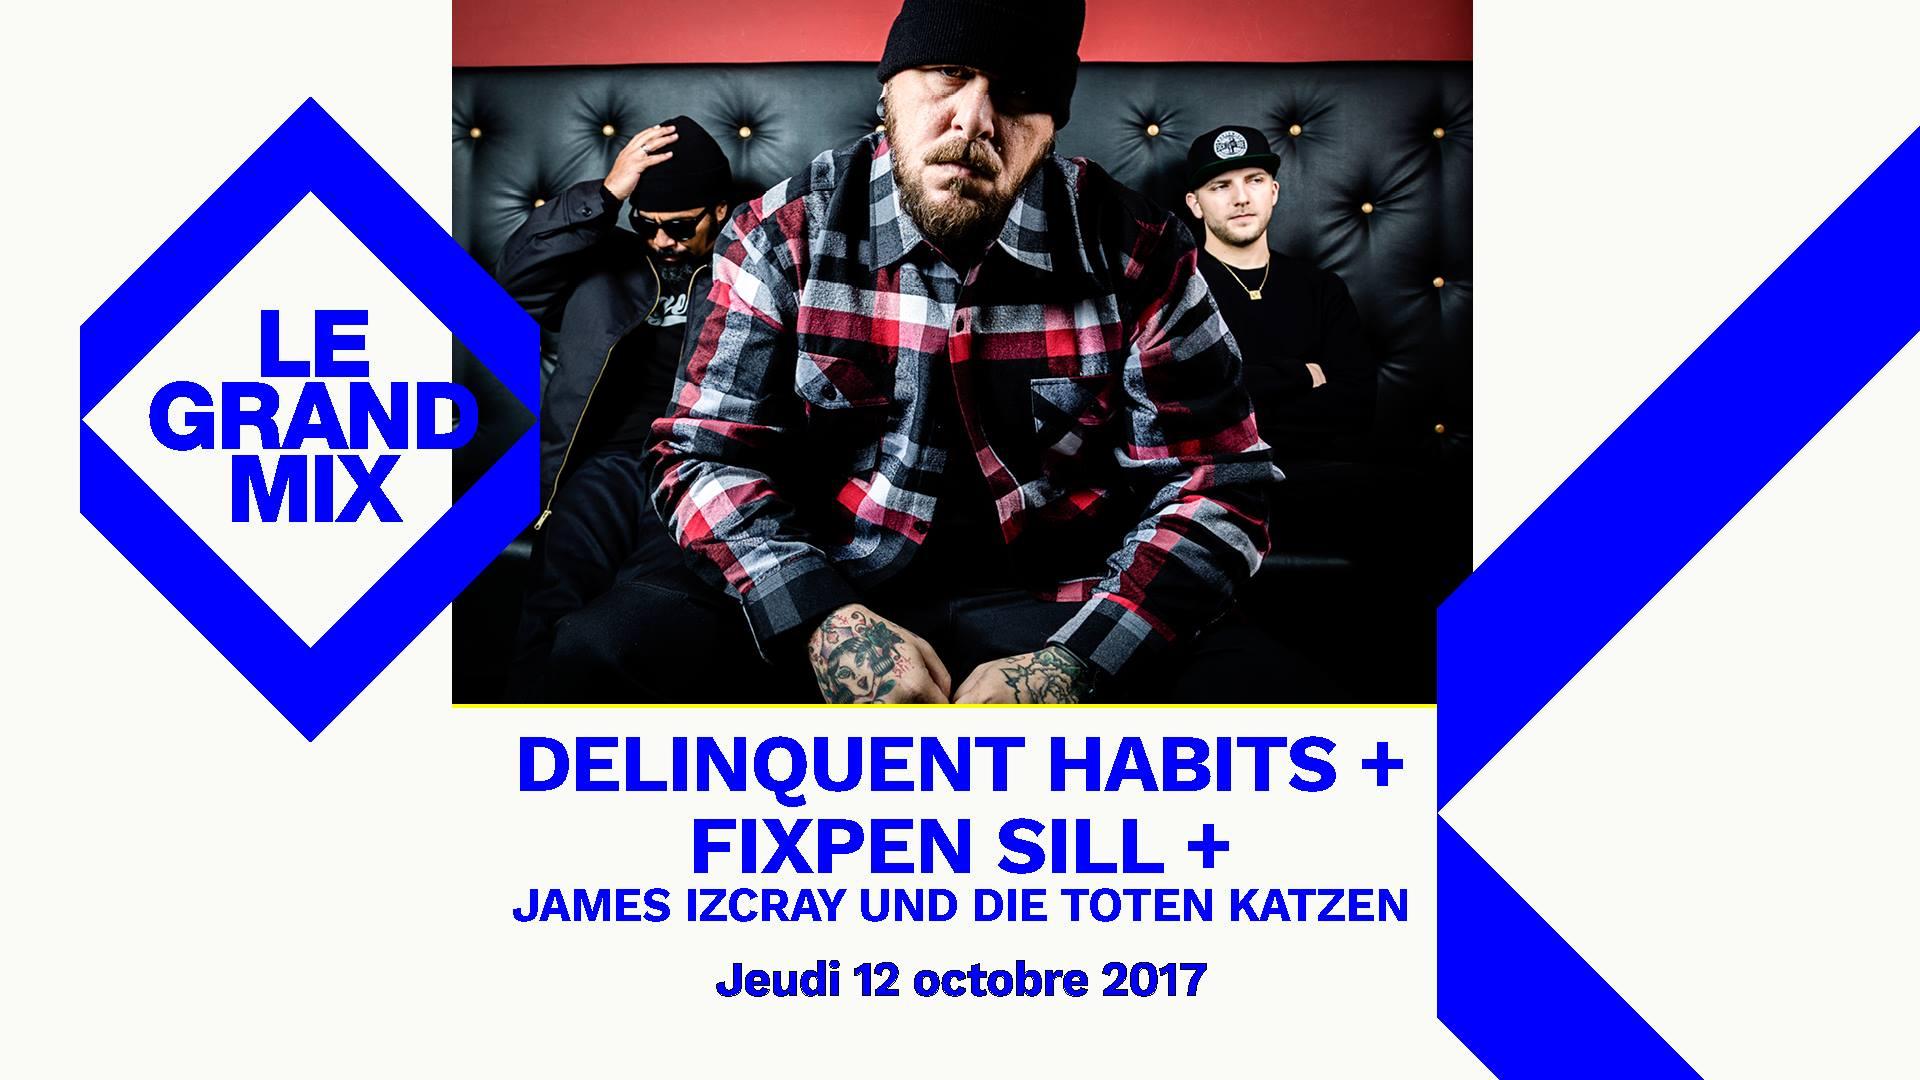 Delinquent Habits + Fixpen Sill + James IzCray und Die Toten Katzen